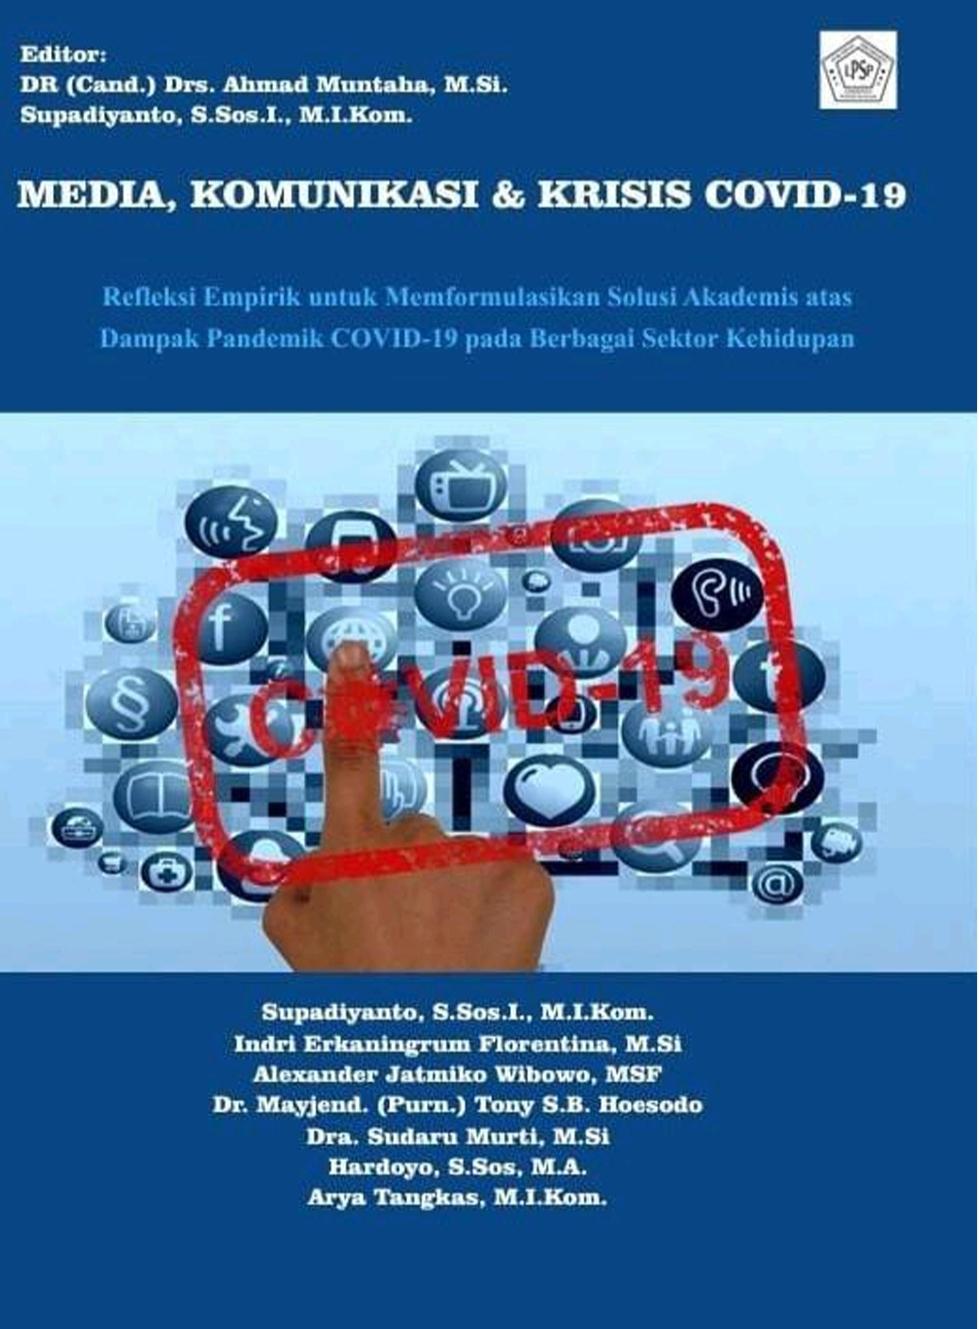 Publikasi: Media, Komunikasi, dan Kris Covid-19